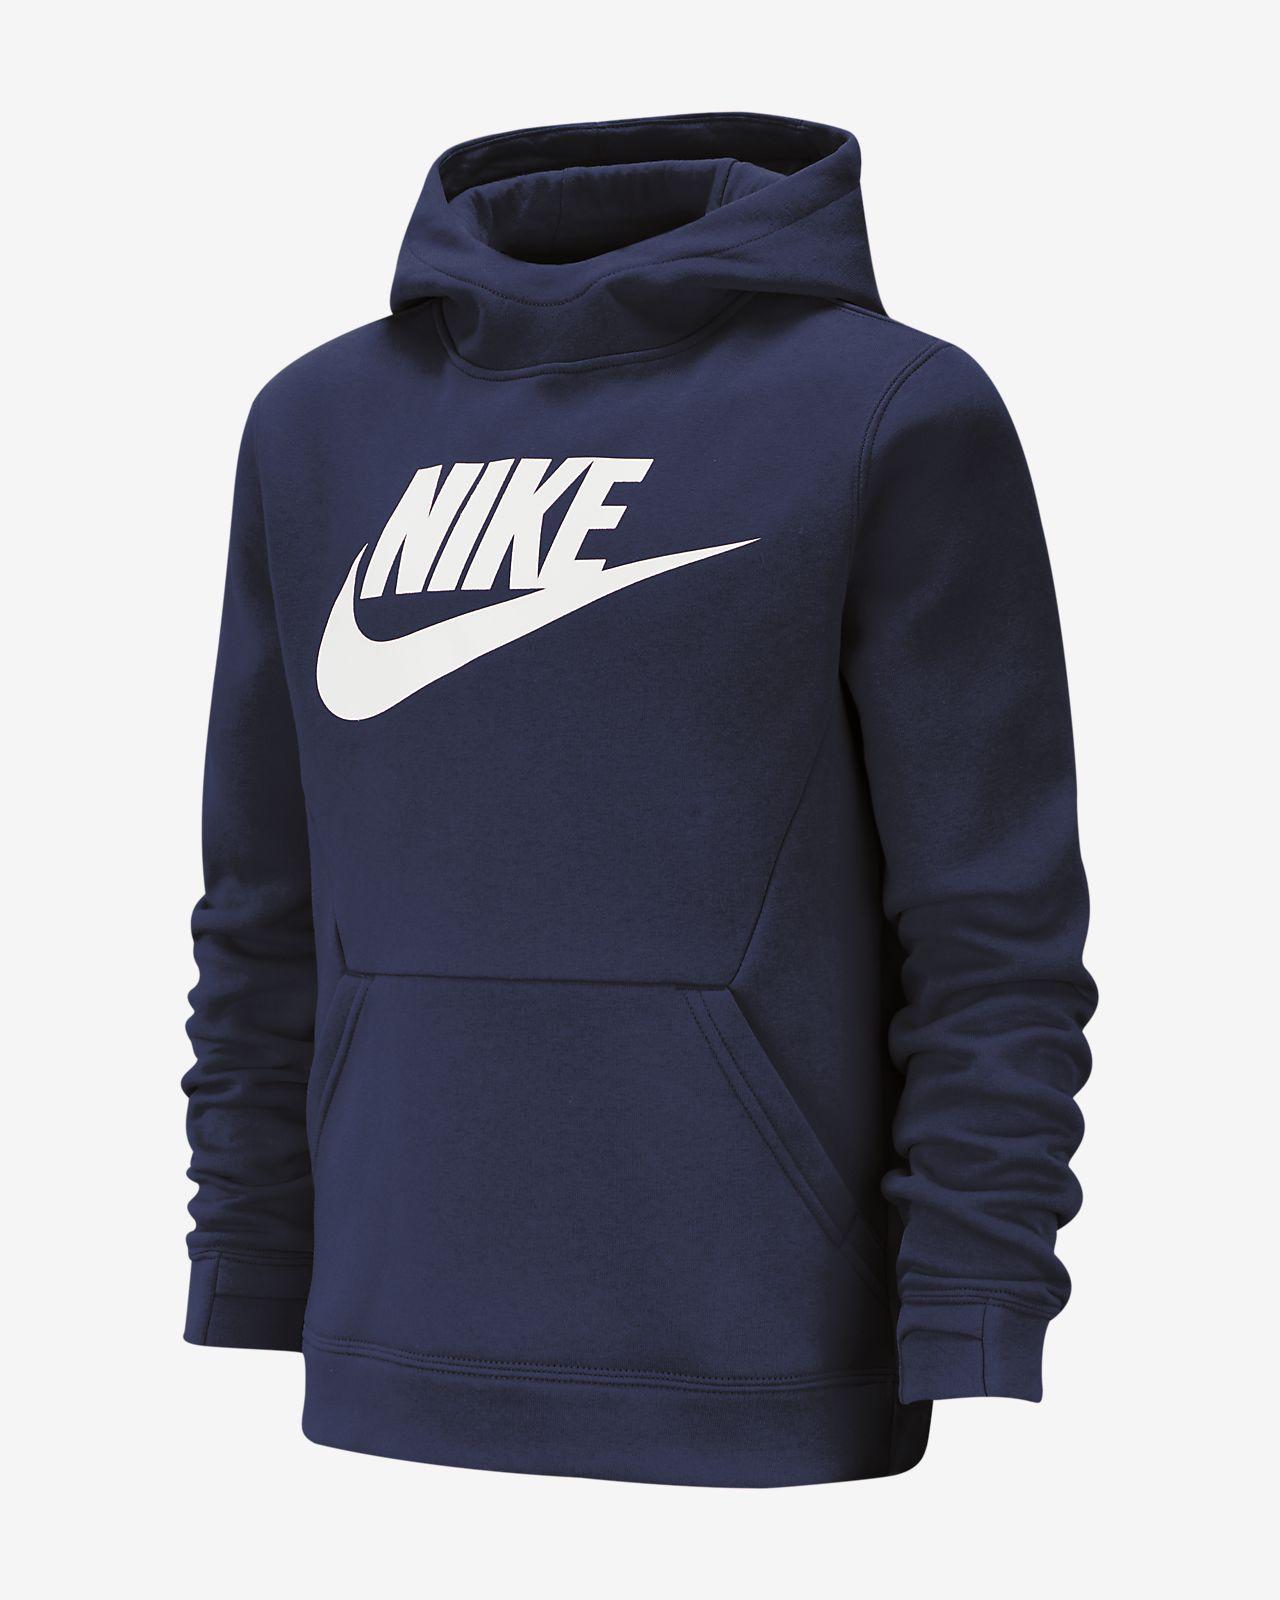 1eb97b33e179 Nike Sportswear Boys  Fleece Pullover Hoodie. Nike.com DK